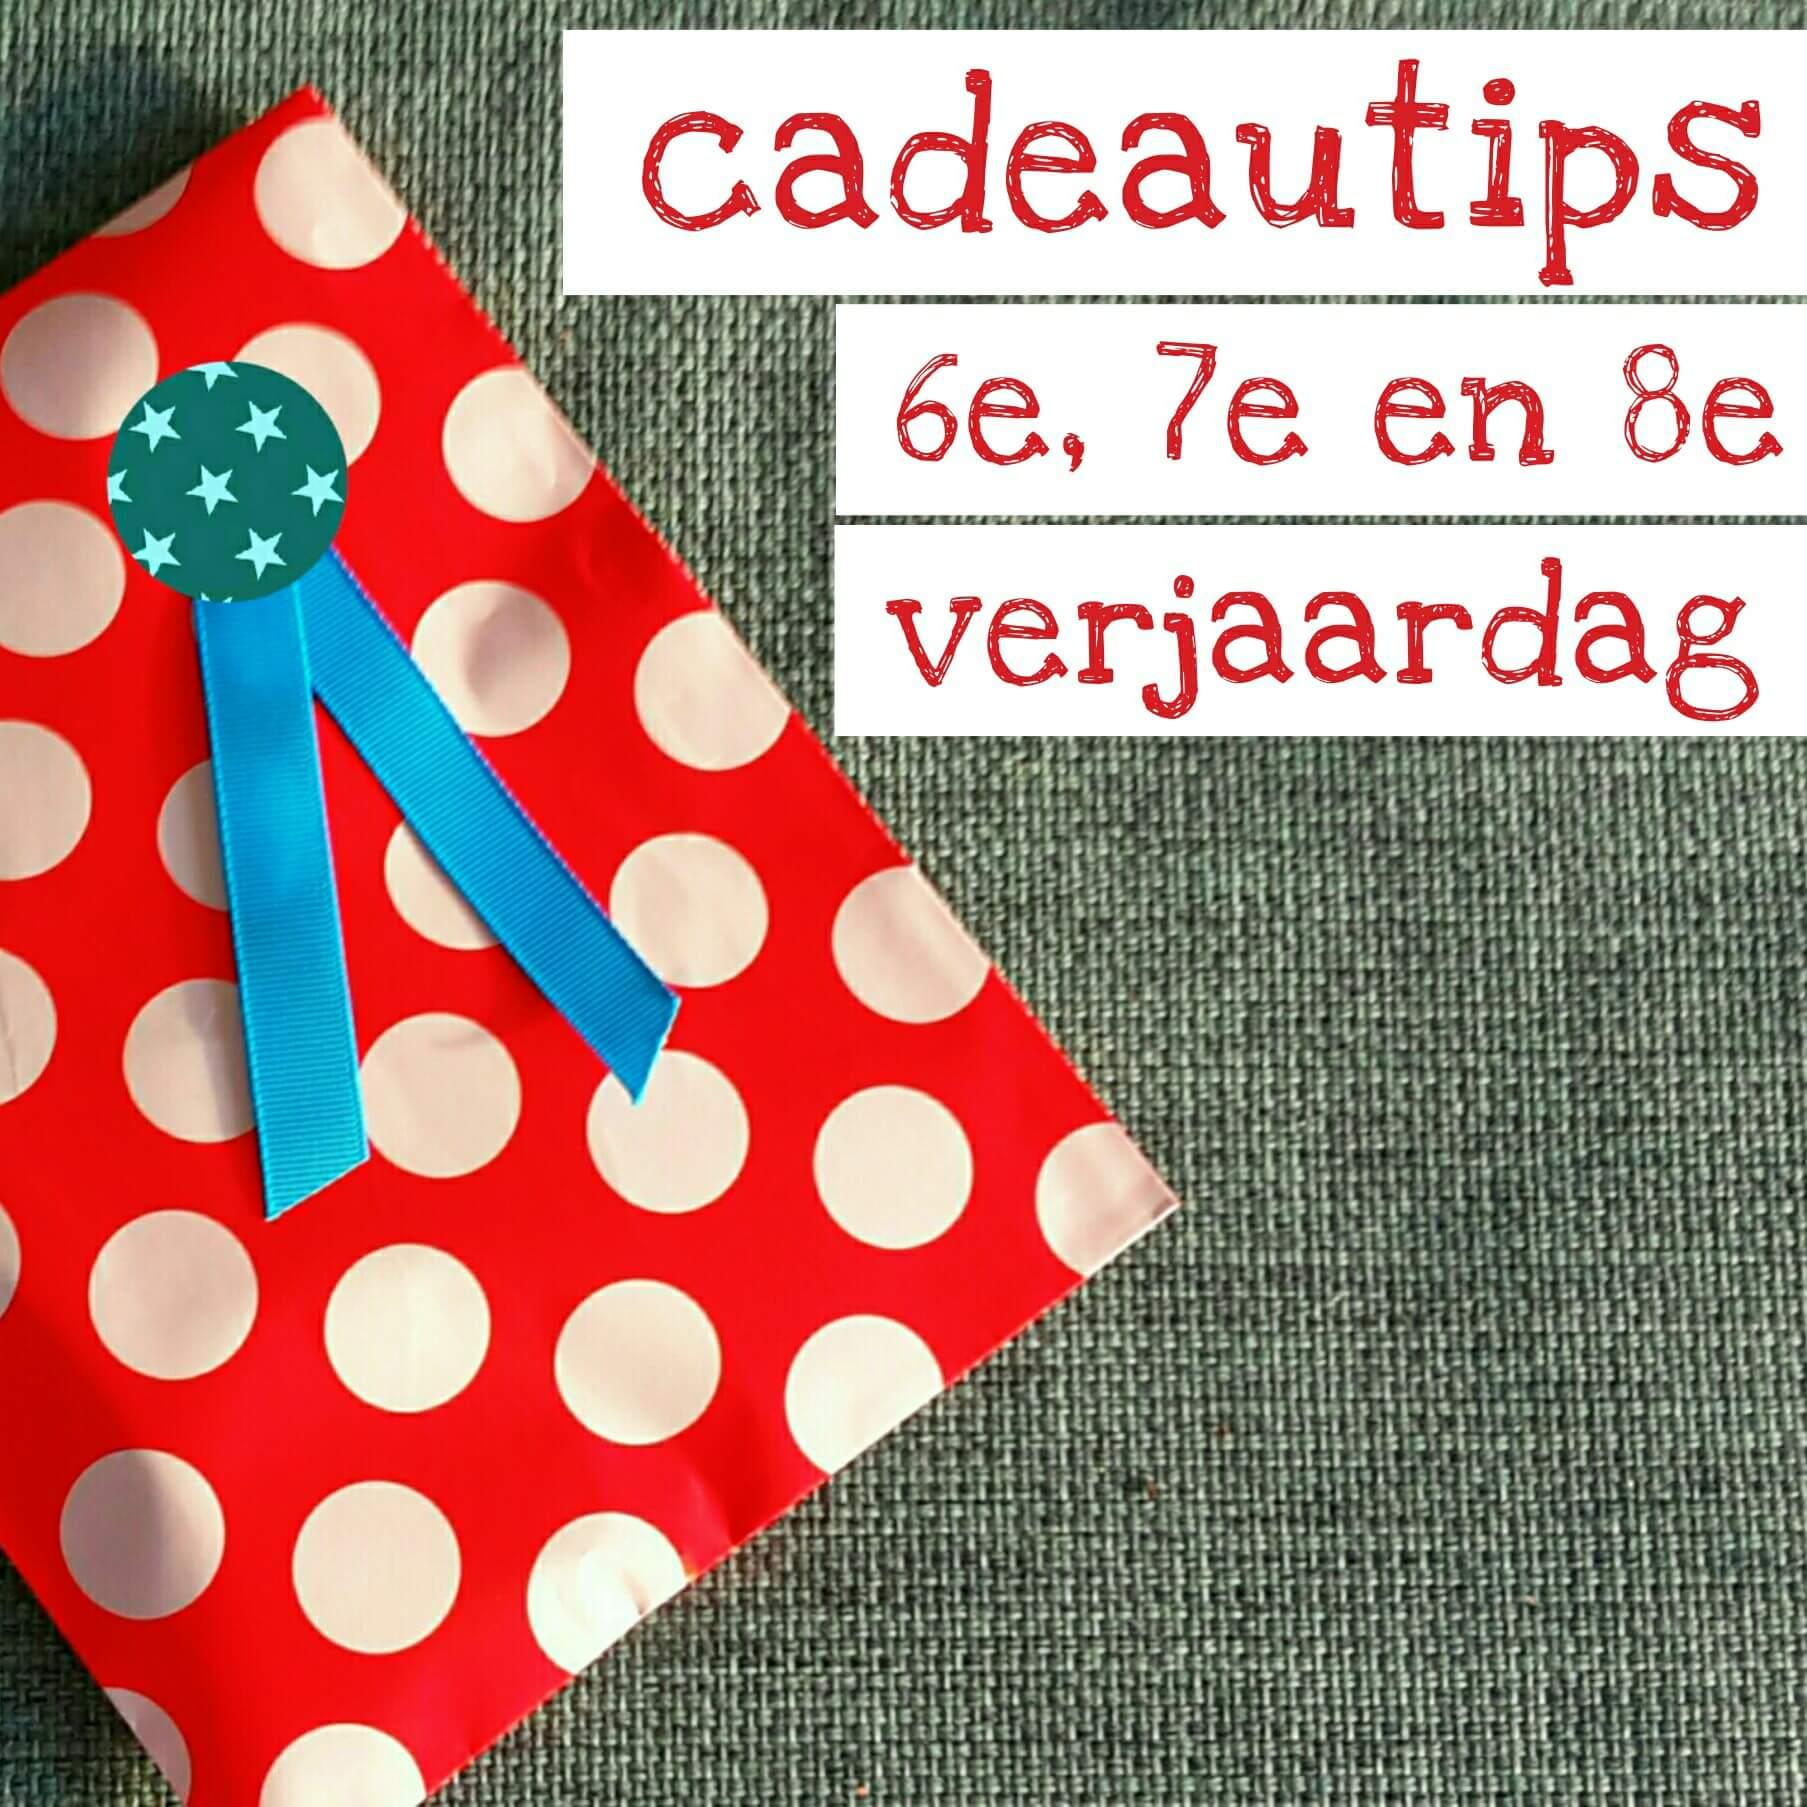 Super Verjaardagscadeau voor kids van 6, 7 of 8 jaar: leuke cadeau tips  ML25